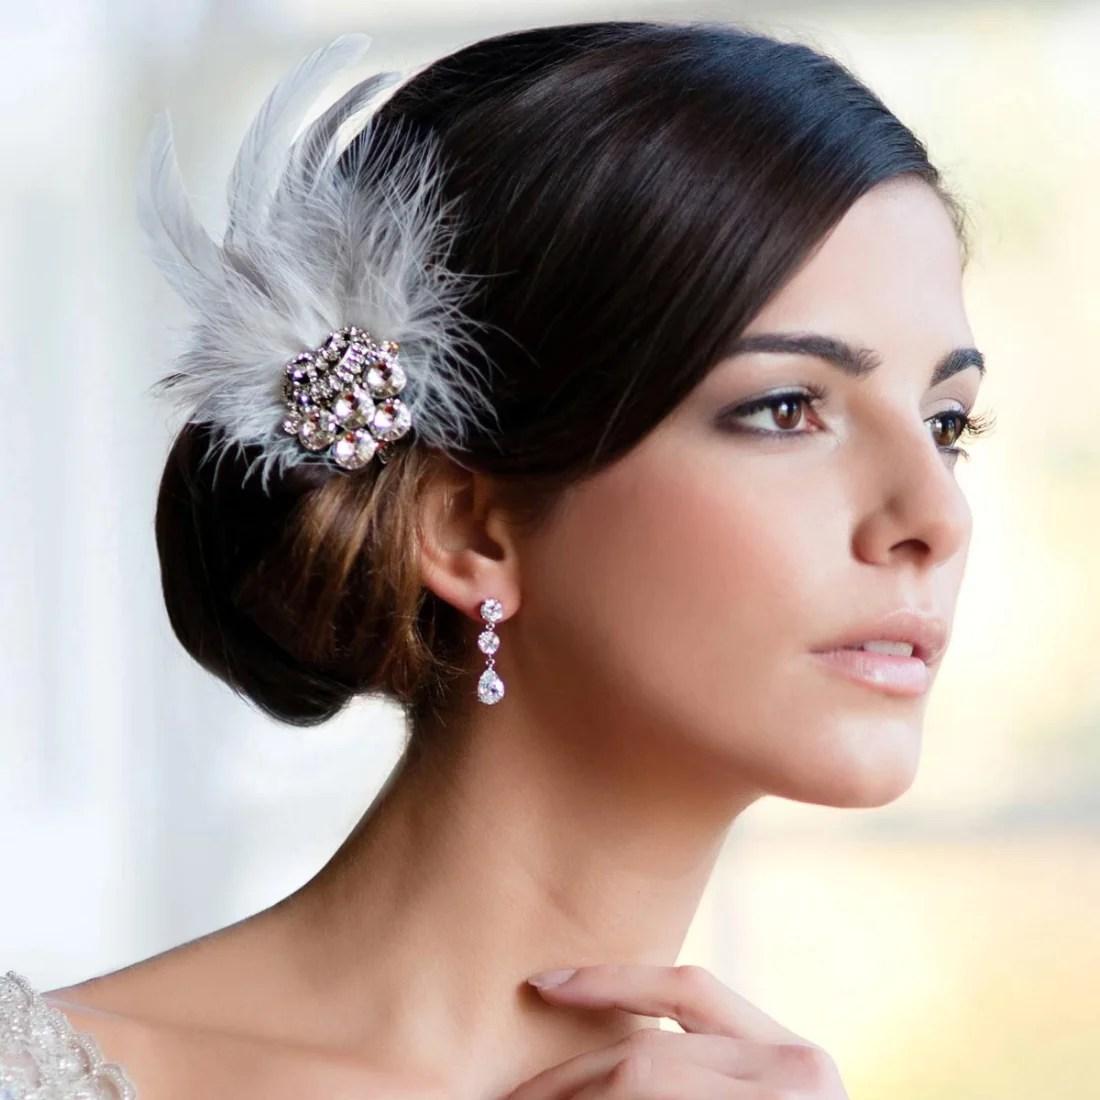 Swan Lake Headpiece Hair Accessories Glitzy Secrets